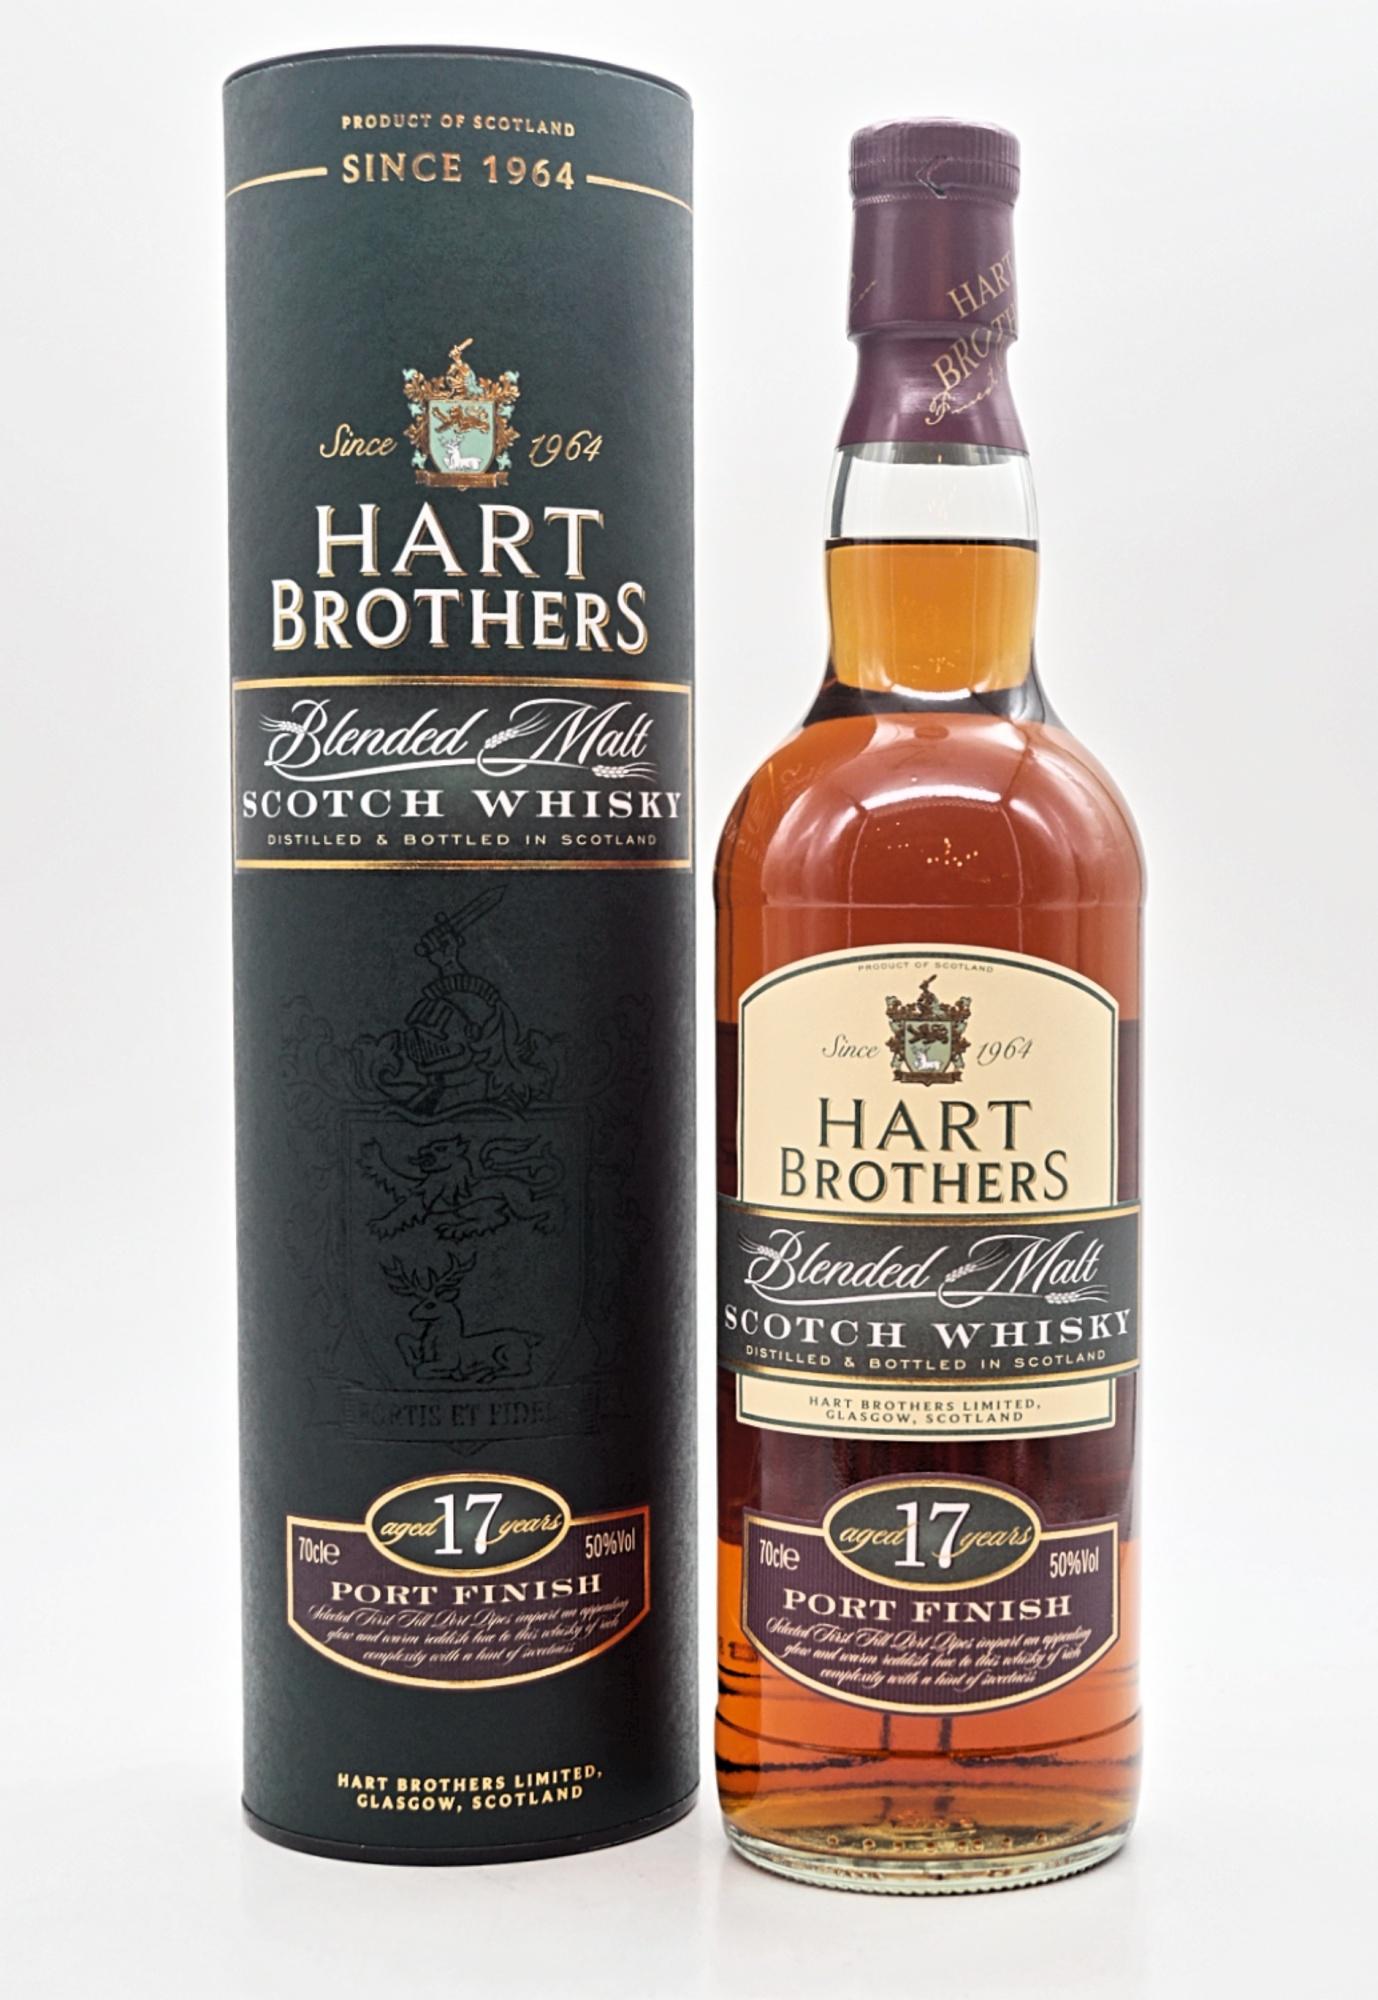 20 Jahre Blended Malt Port Finish Scotch Whisky